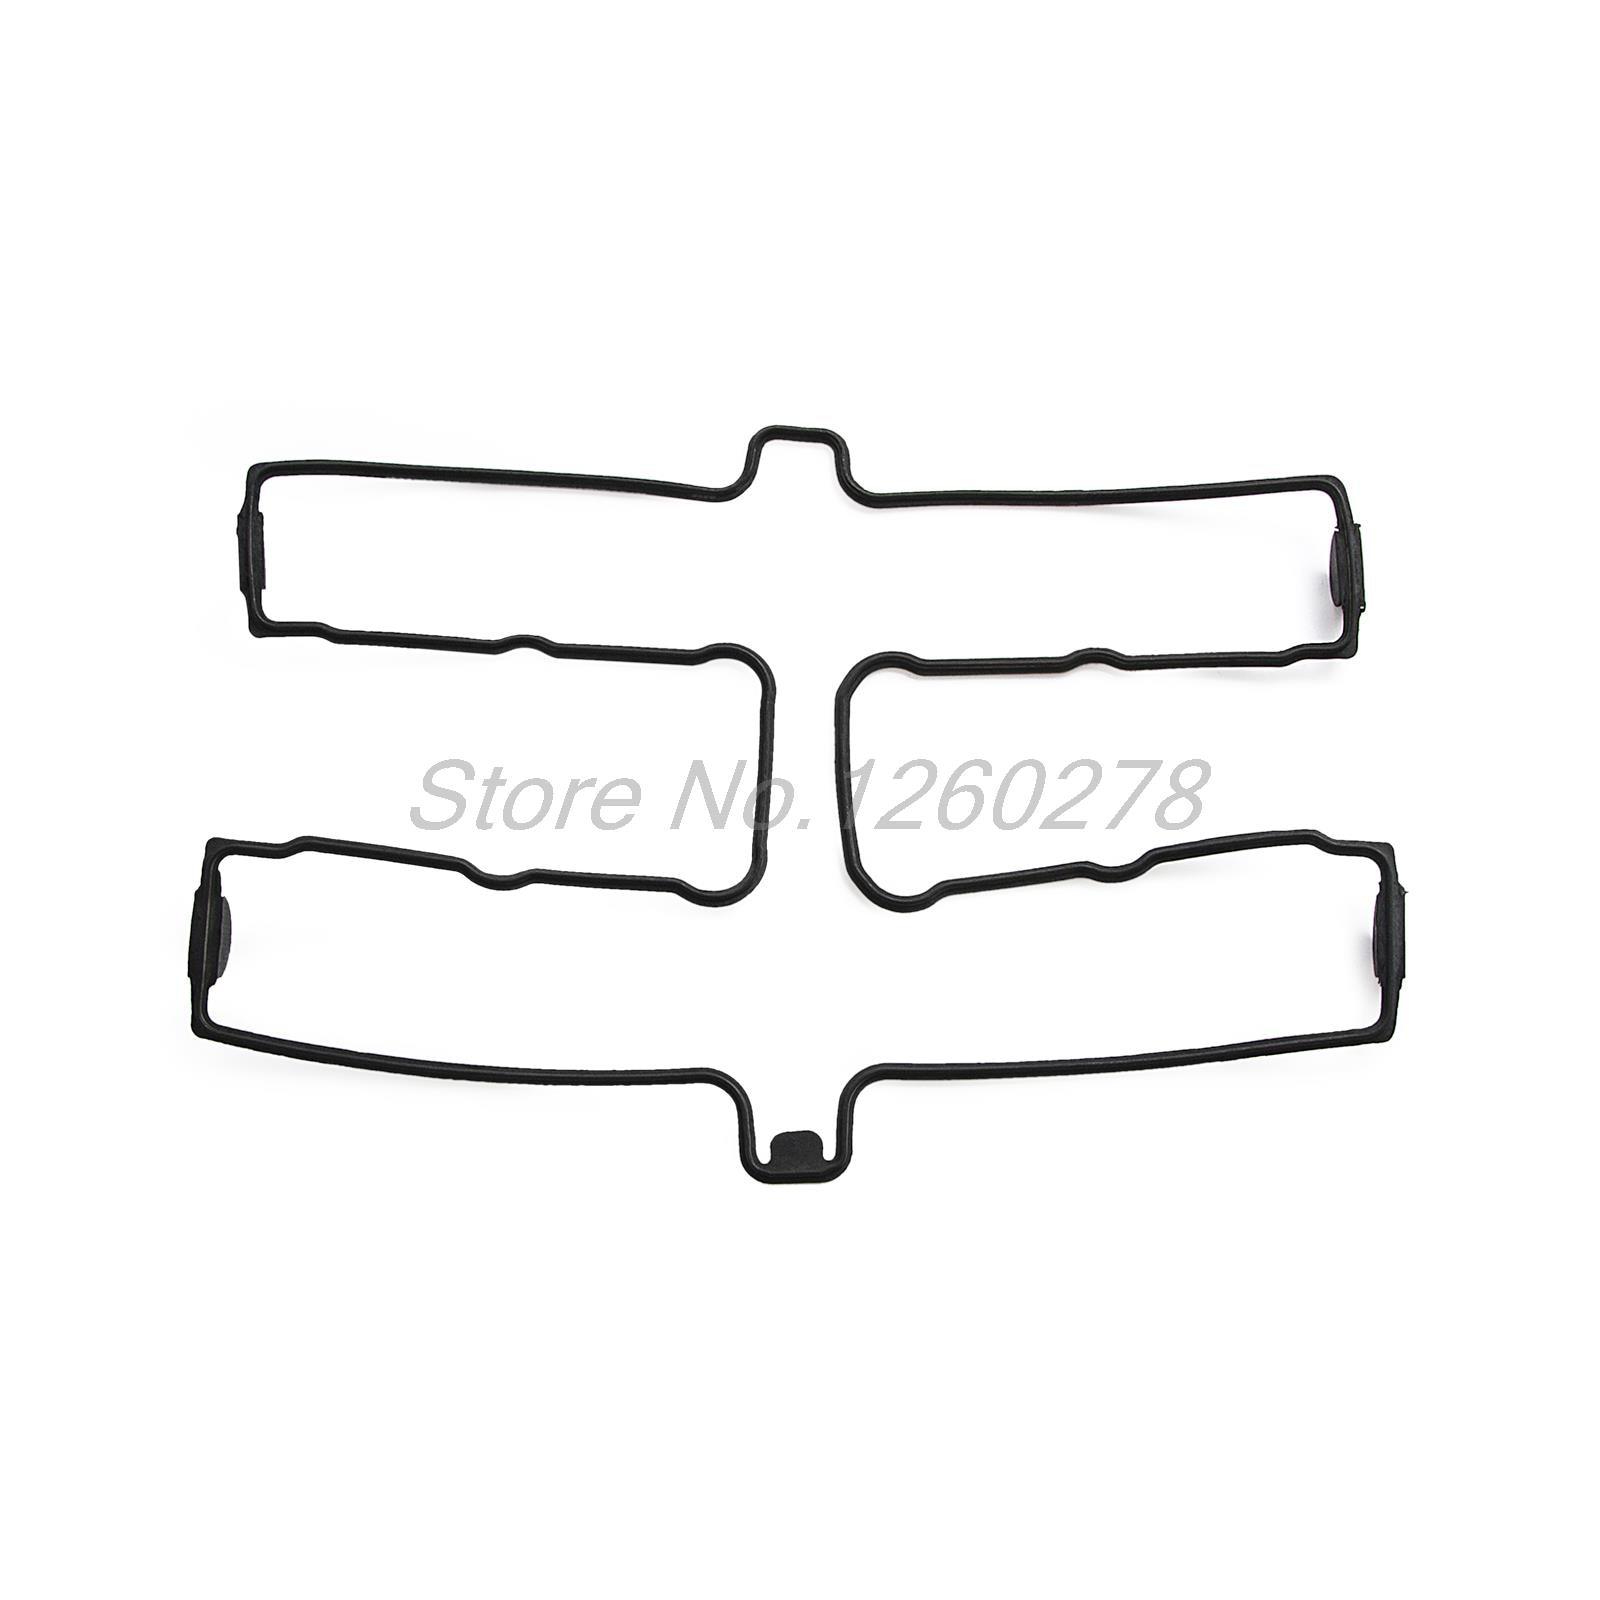 Nicecnc Cylinder Head Cover Gasket For Yamaha Xjr400